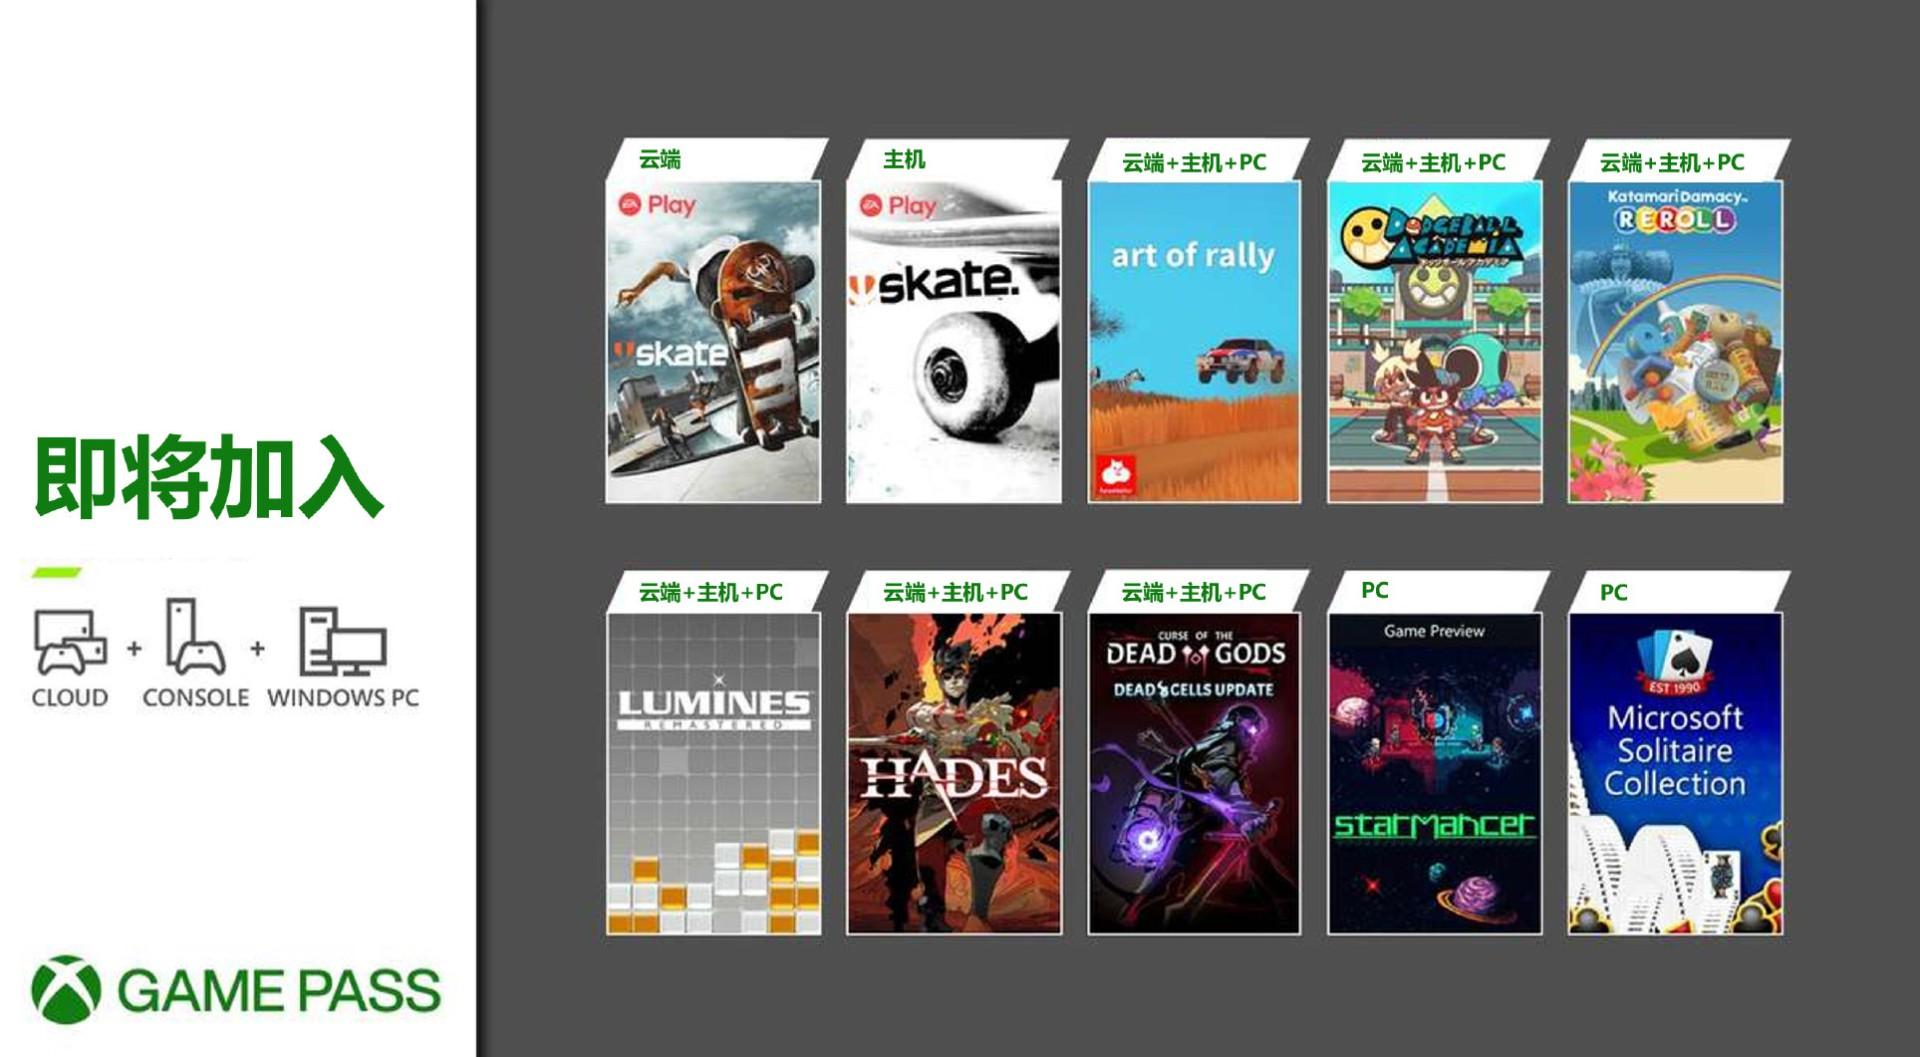 XGP八月新增游戏:《哈迪斯》、《无间冥寺》等